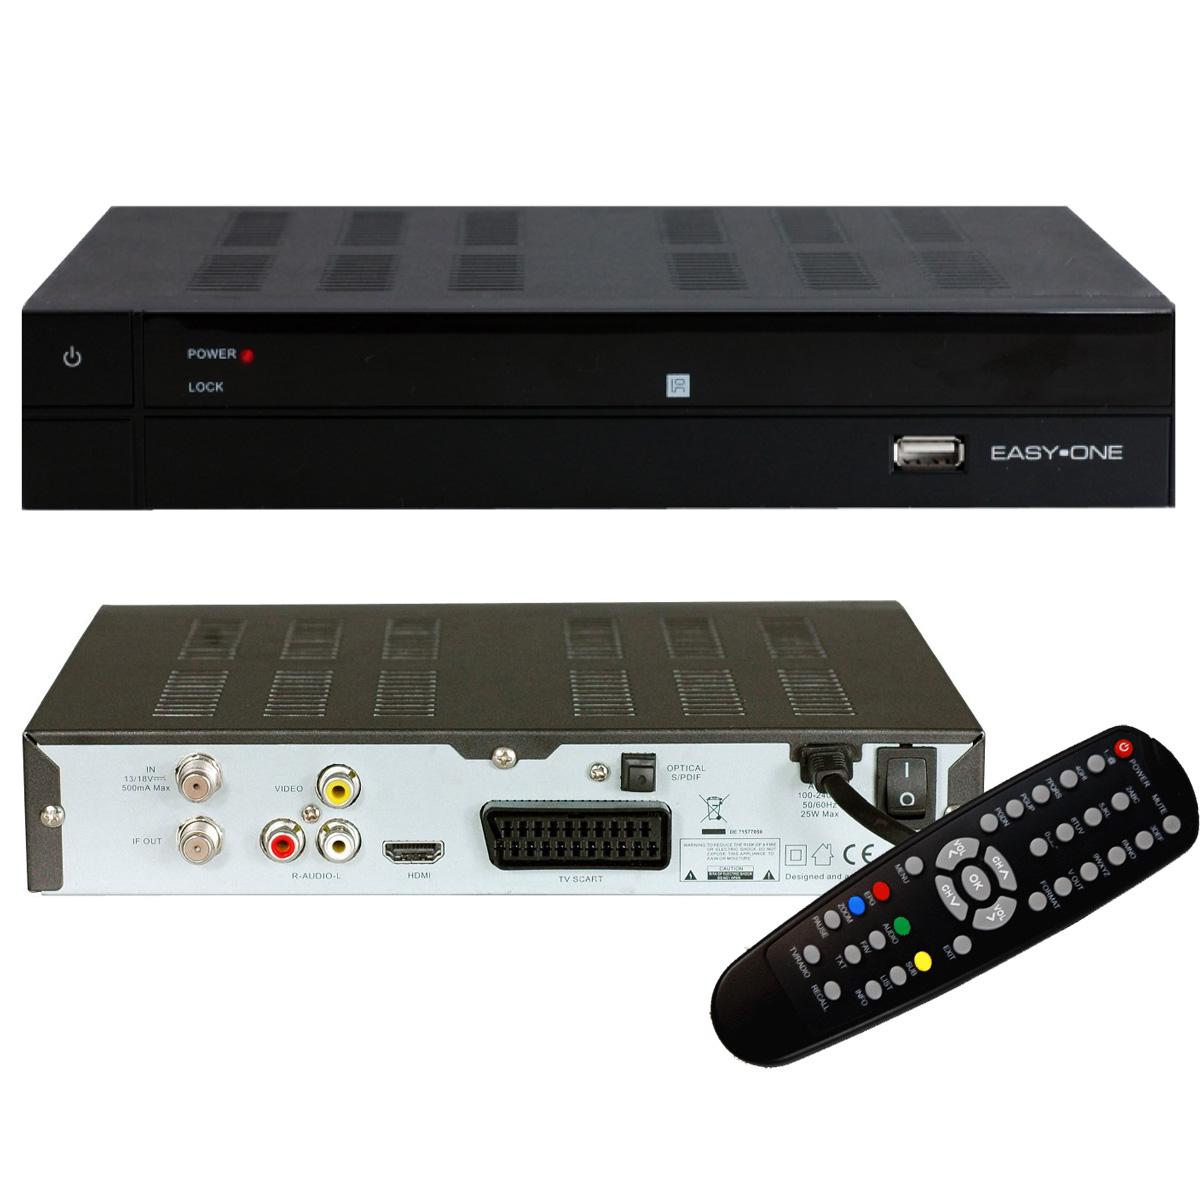 easy one s hd 1 digitaler hdtv satelliten receiver hdmi. Black Bedroom Furniture Sets. Home Design Ideas